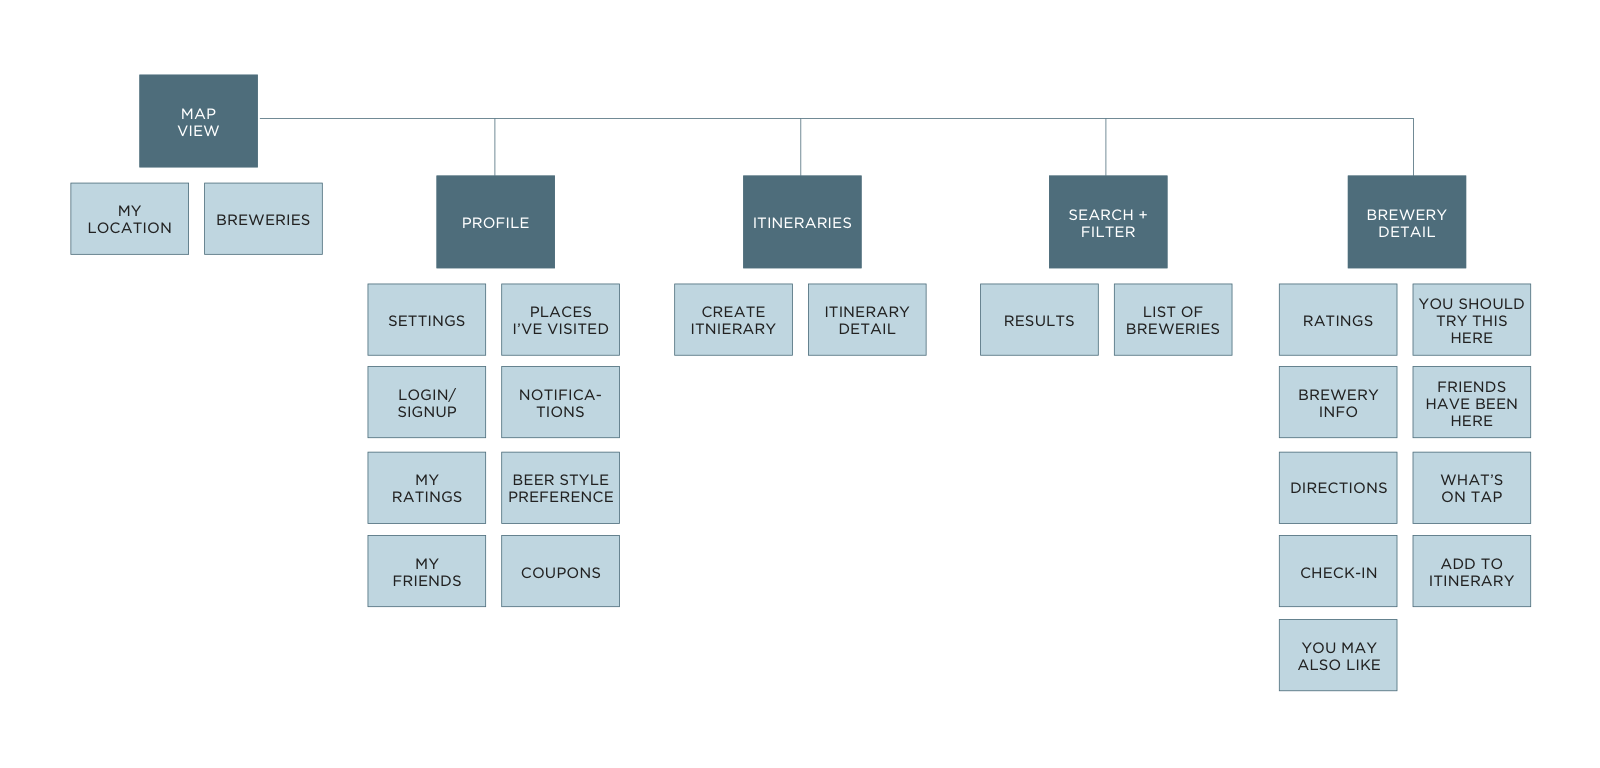 18-INFORMATION ARCHITECTURE